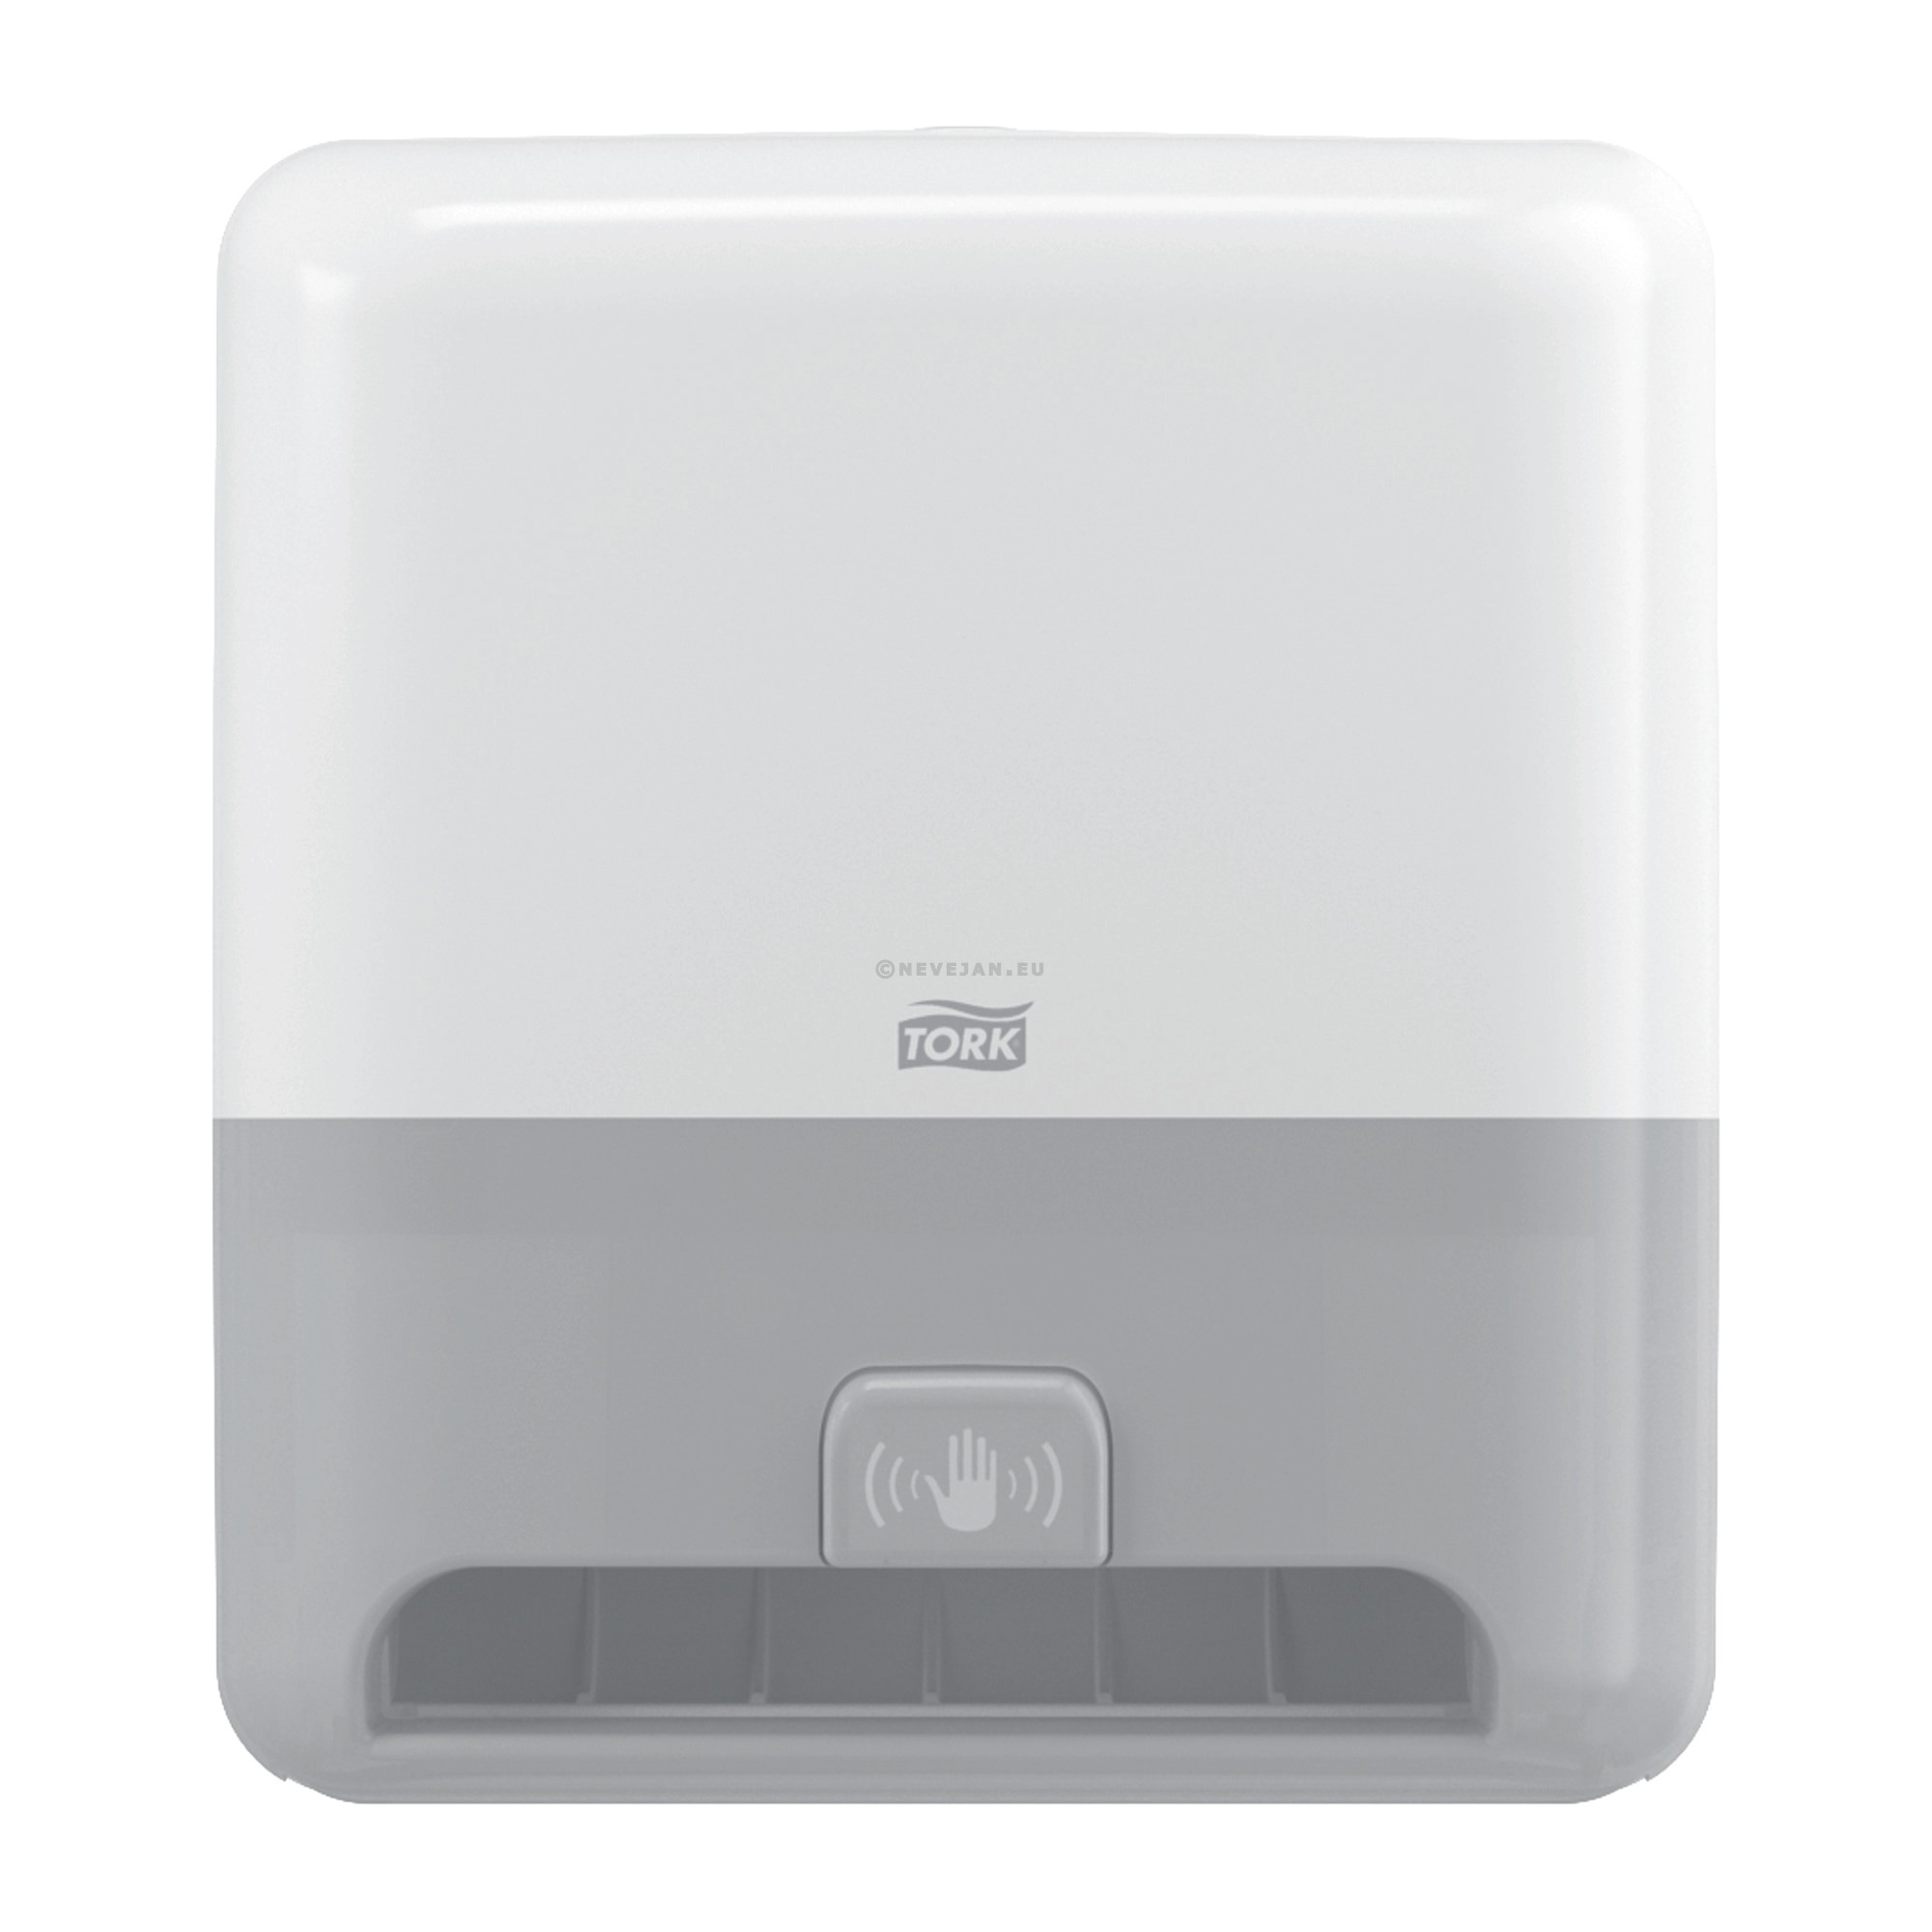 Tork Matic Sensor Handdoekrol Dispenser wit 551100